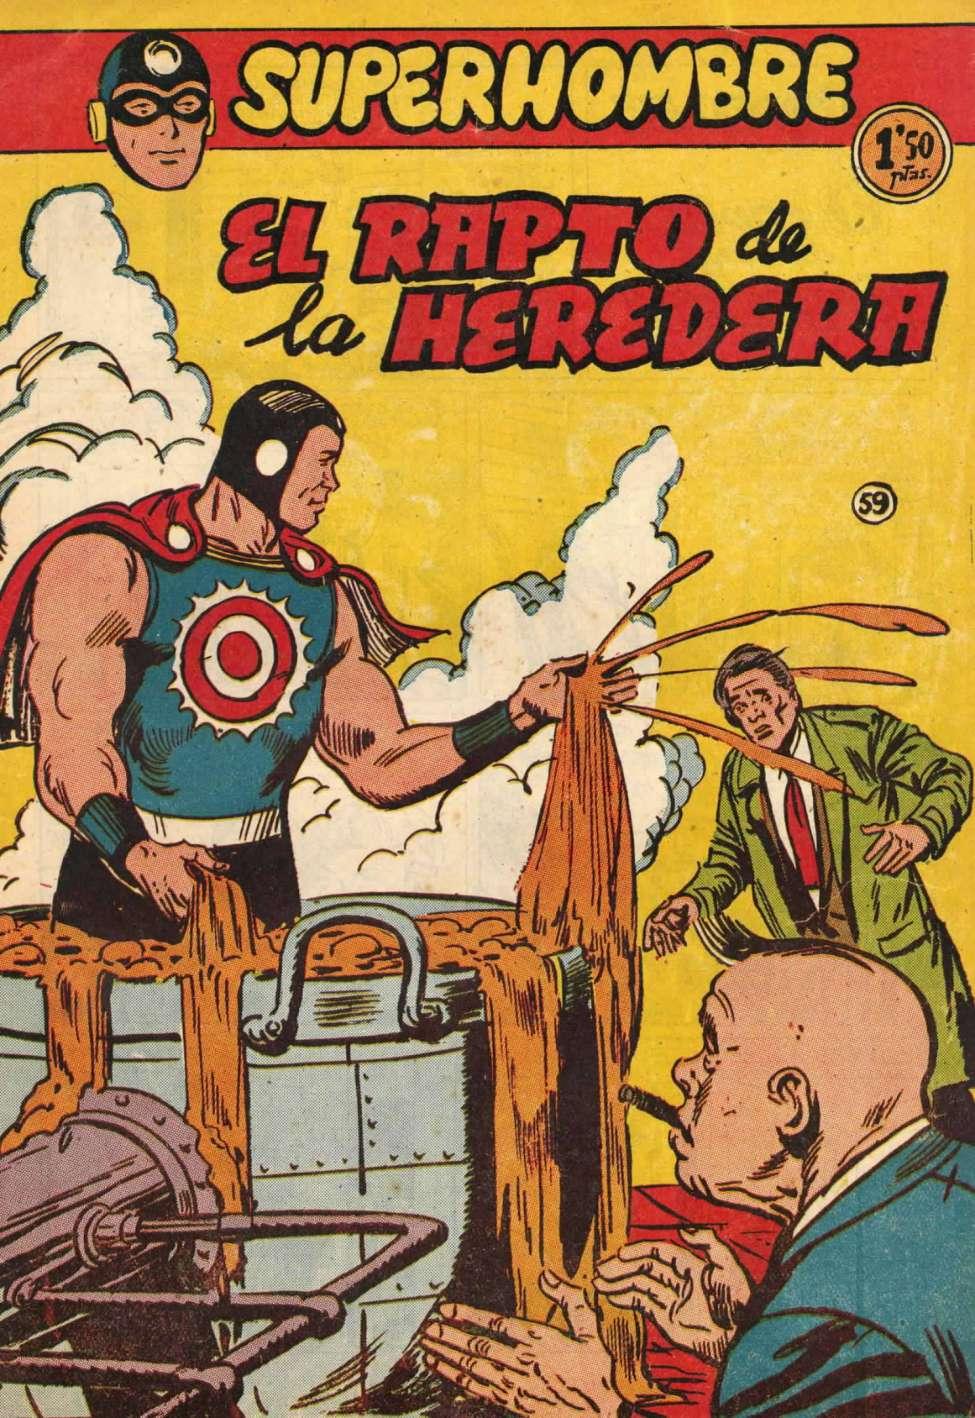 Comic Book Cover For SuperHombre 59 El rapto de la heredera